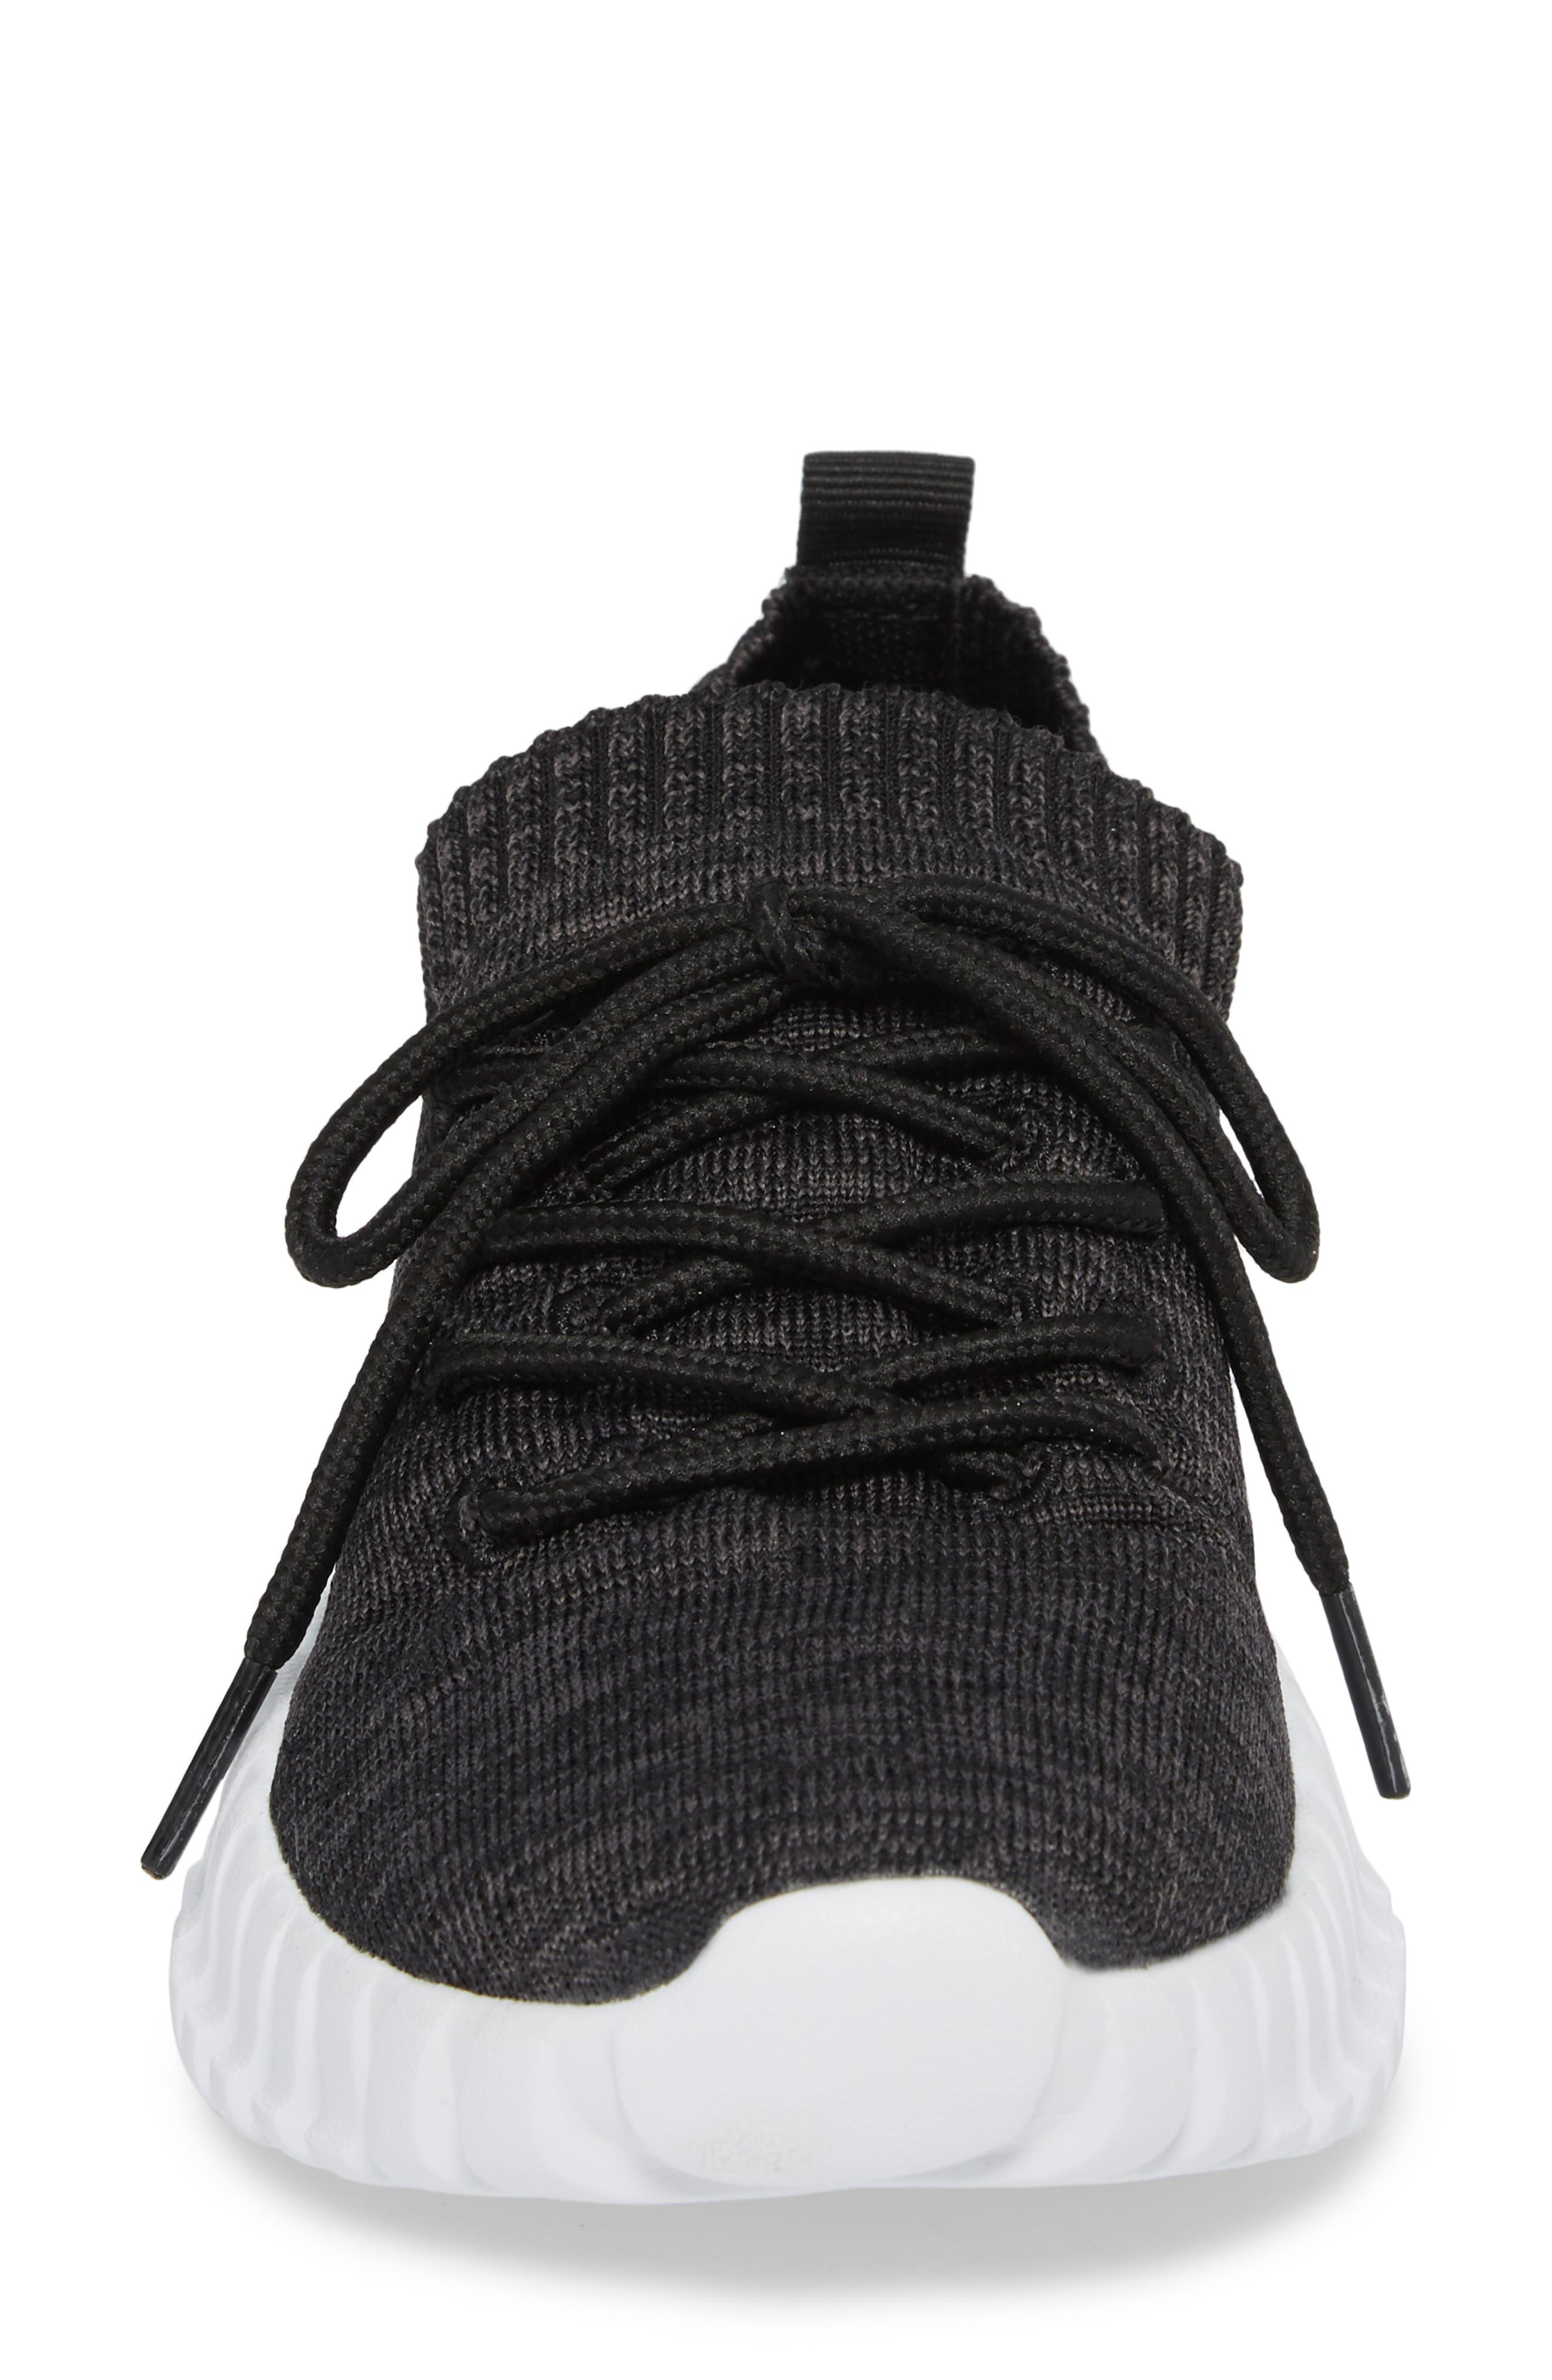 Gravity Sneaker,                             Alternate thumbnail 4, color,                             BLACK GREY